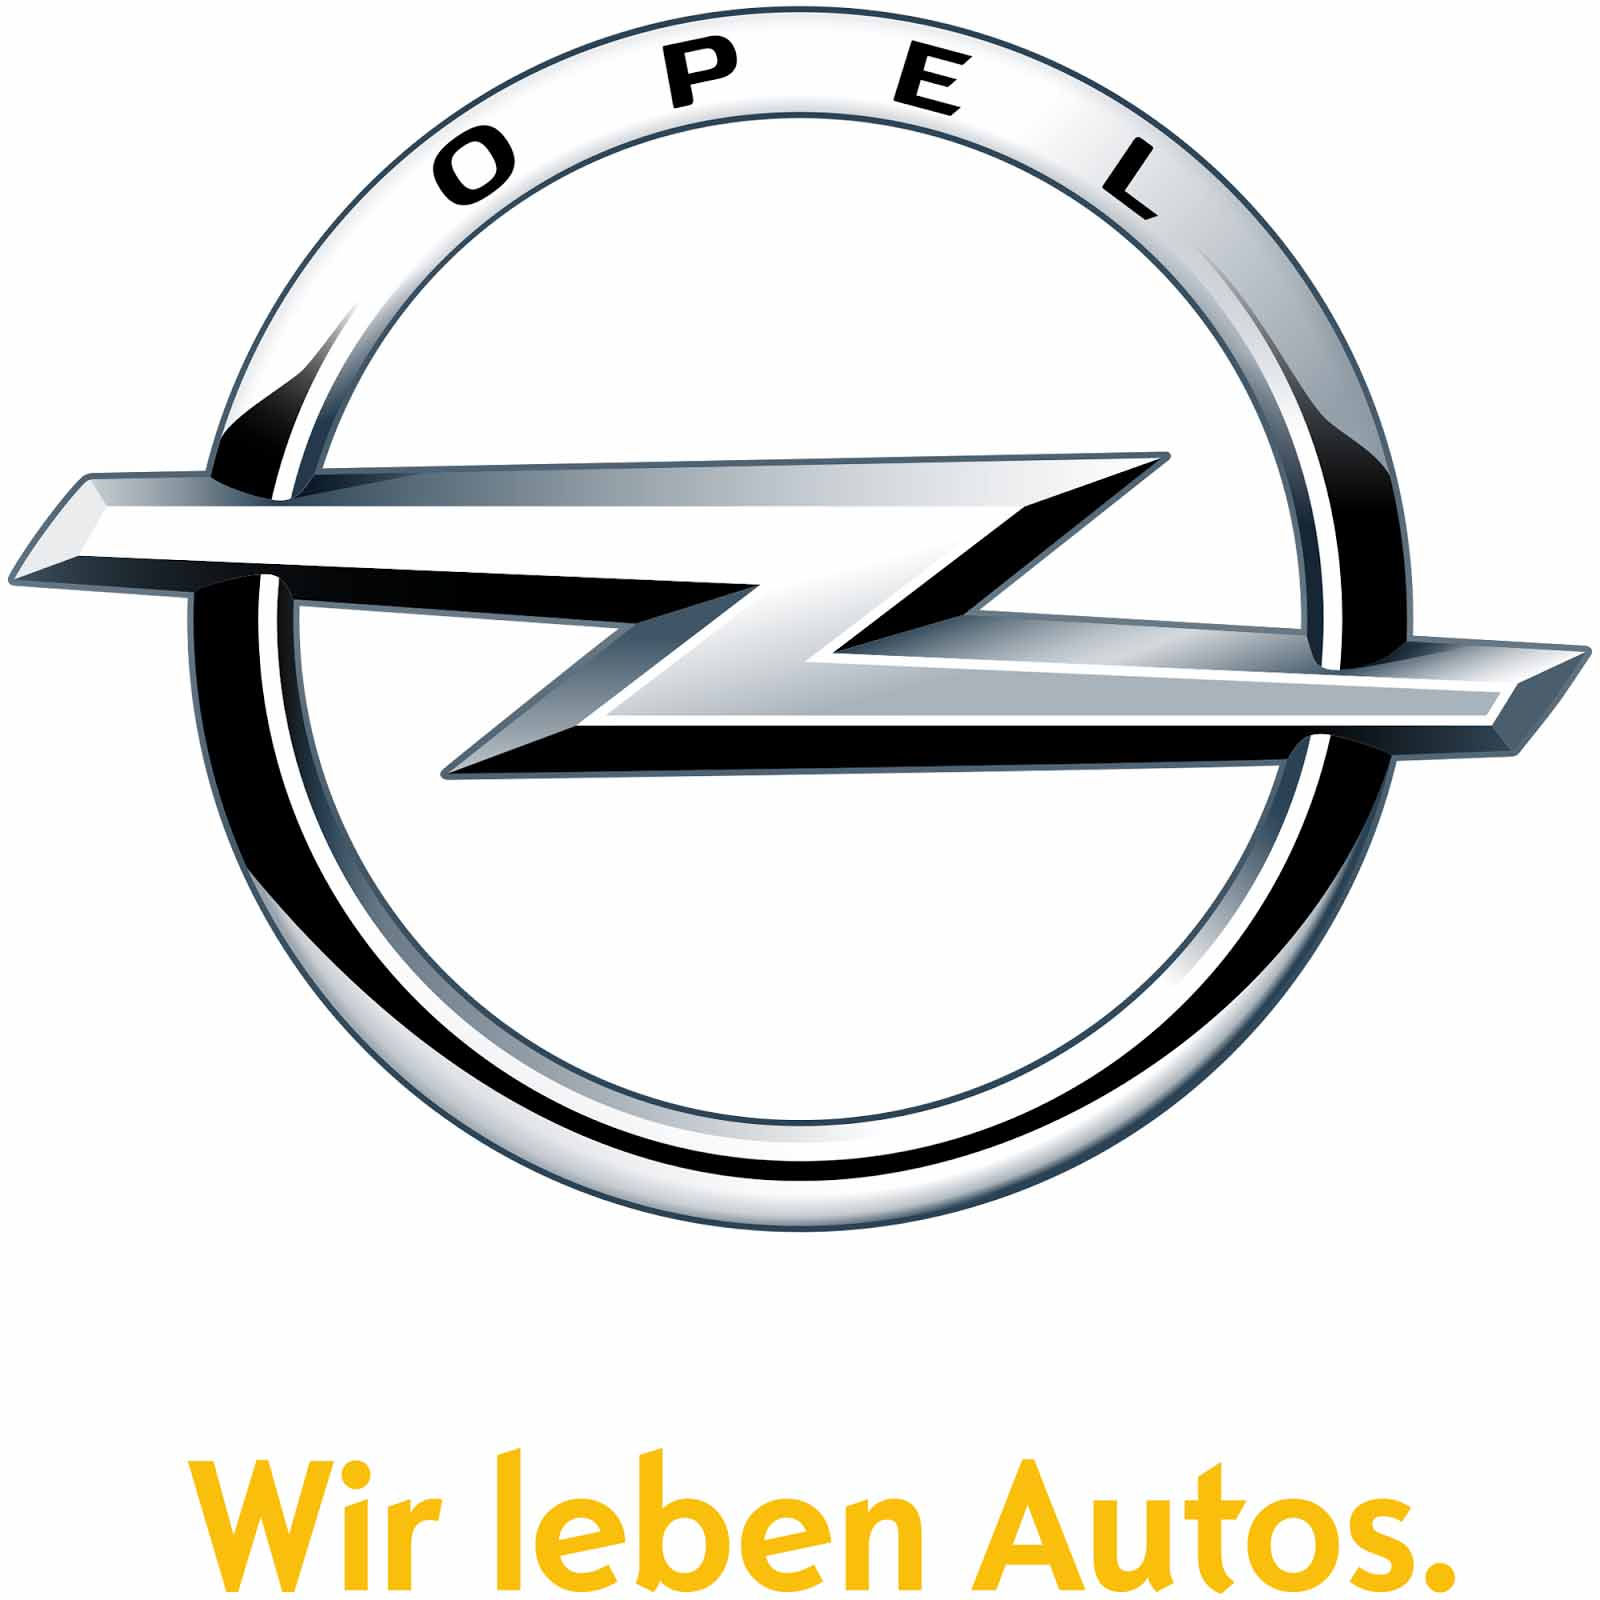 Original Opel CDTI Emblem Logo Opel Corsa 2006 Astra 2009+Insignia 2008+